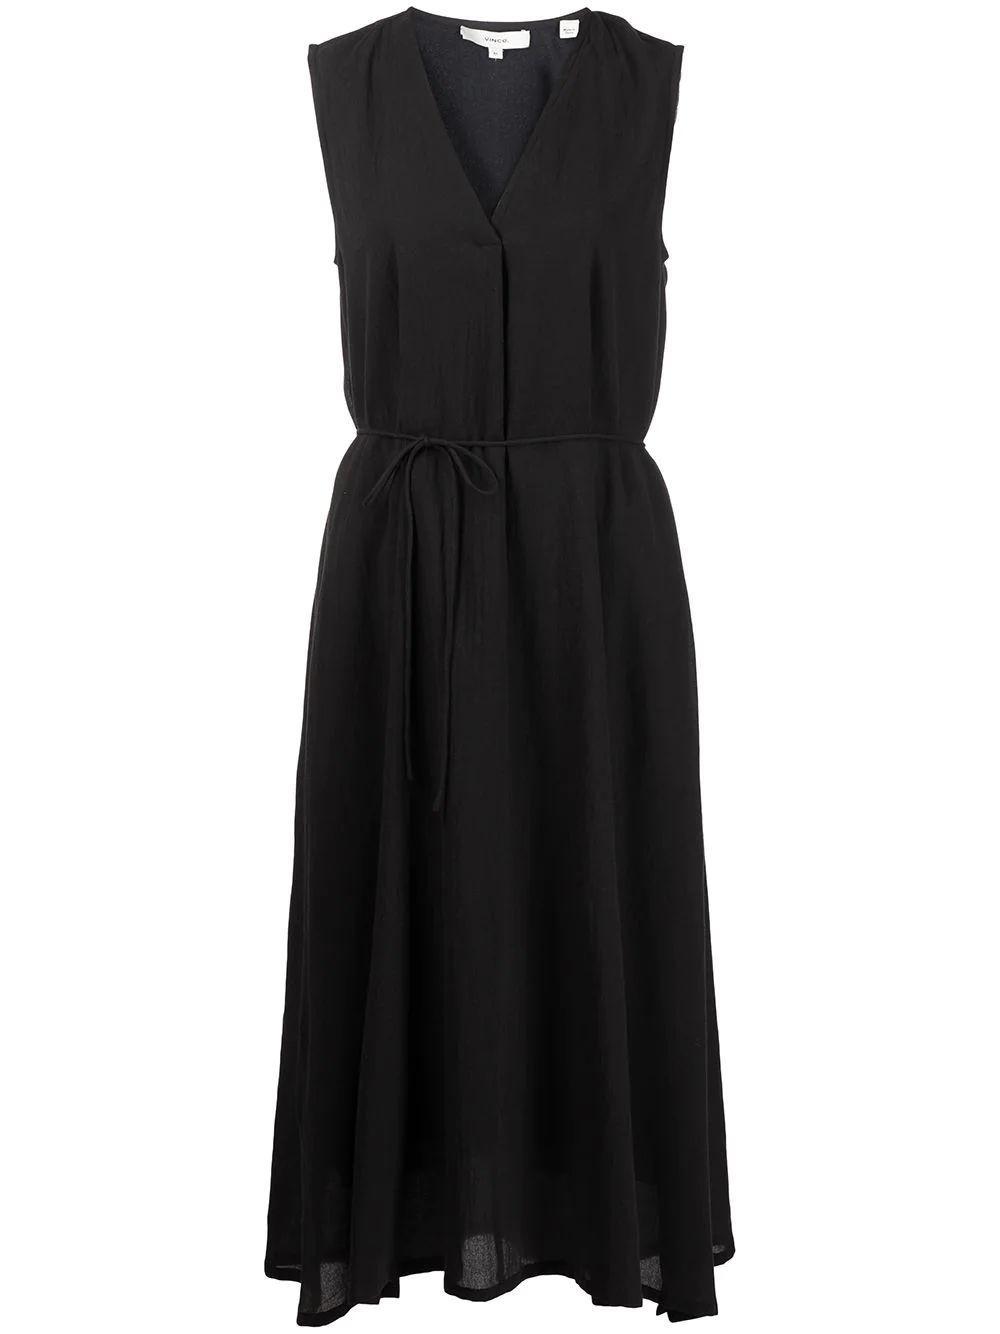 Lightweight Sleeveless Dress Item # V758051122